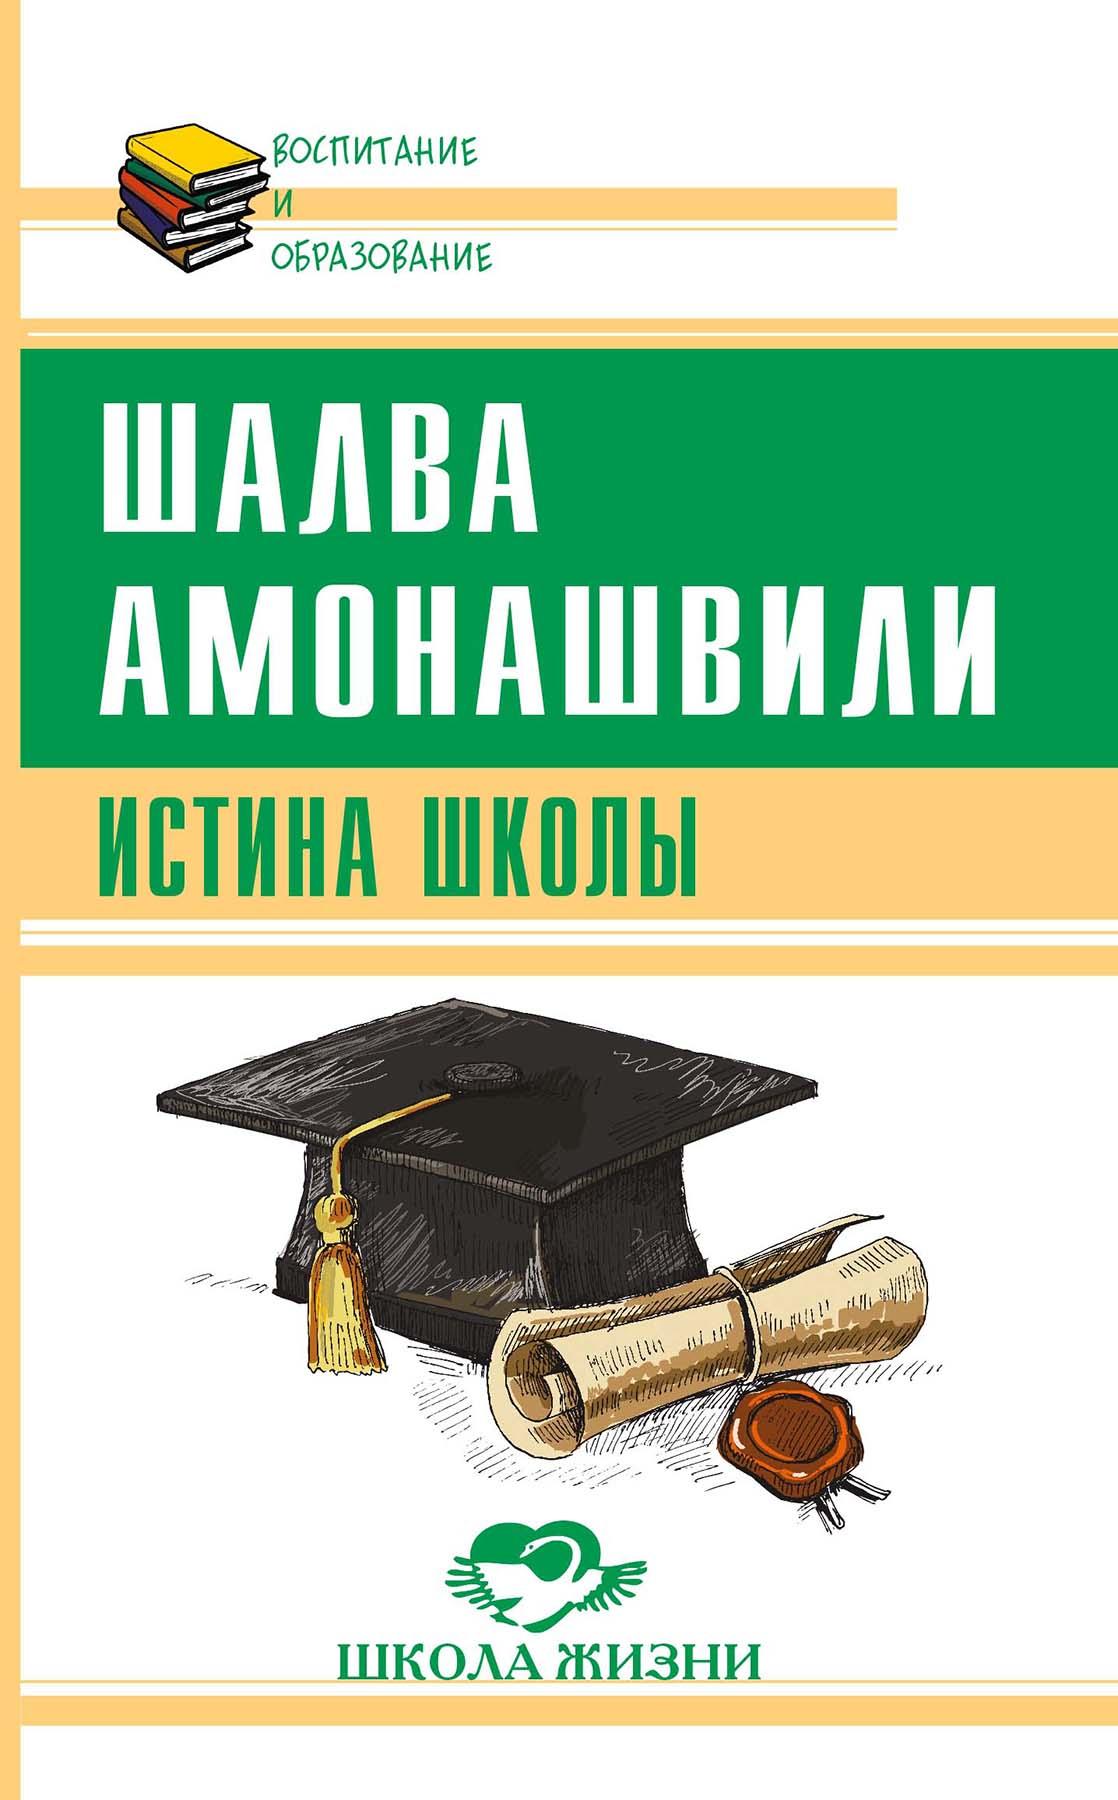 Шалва Амонашвили Истина школы борис черных шалва амонашвили и его друзья в провинции